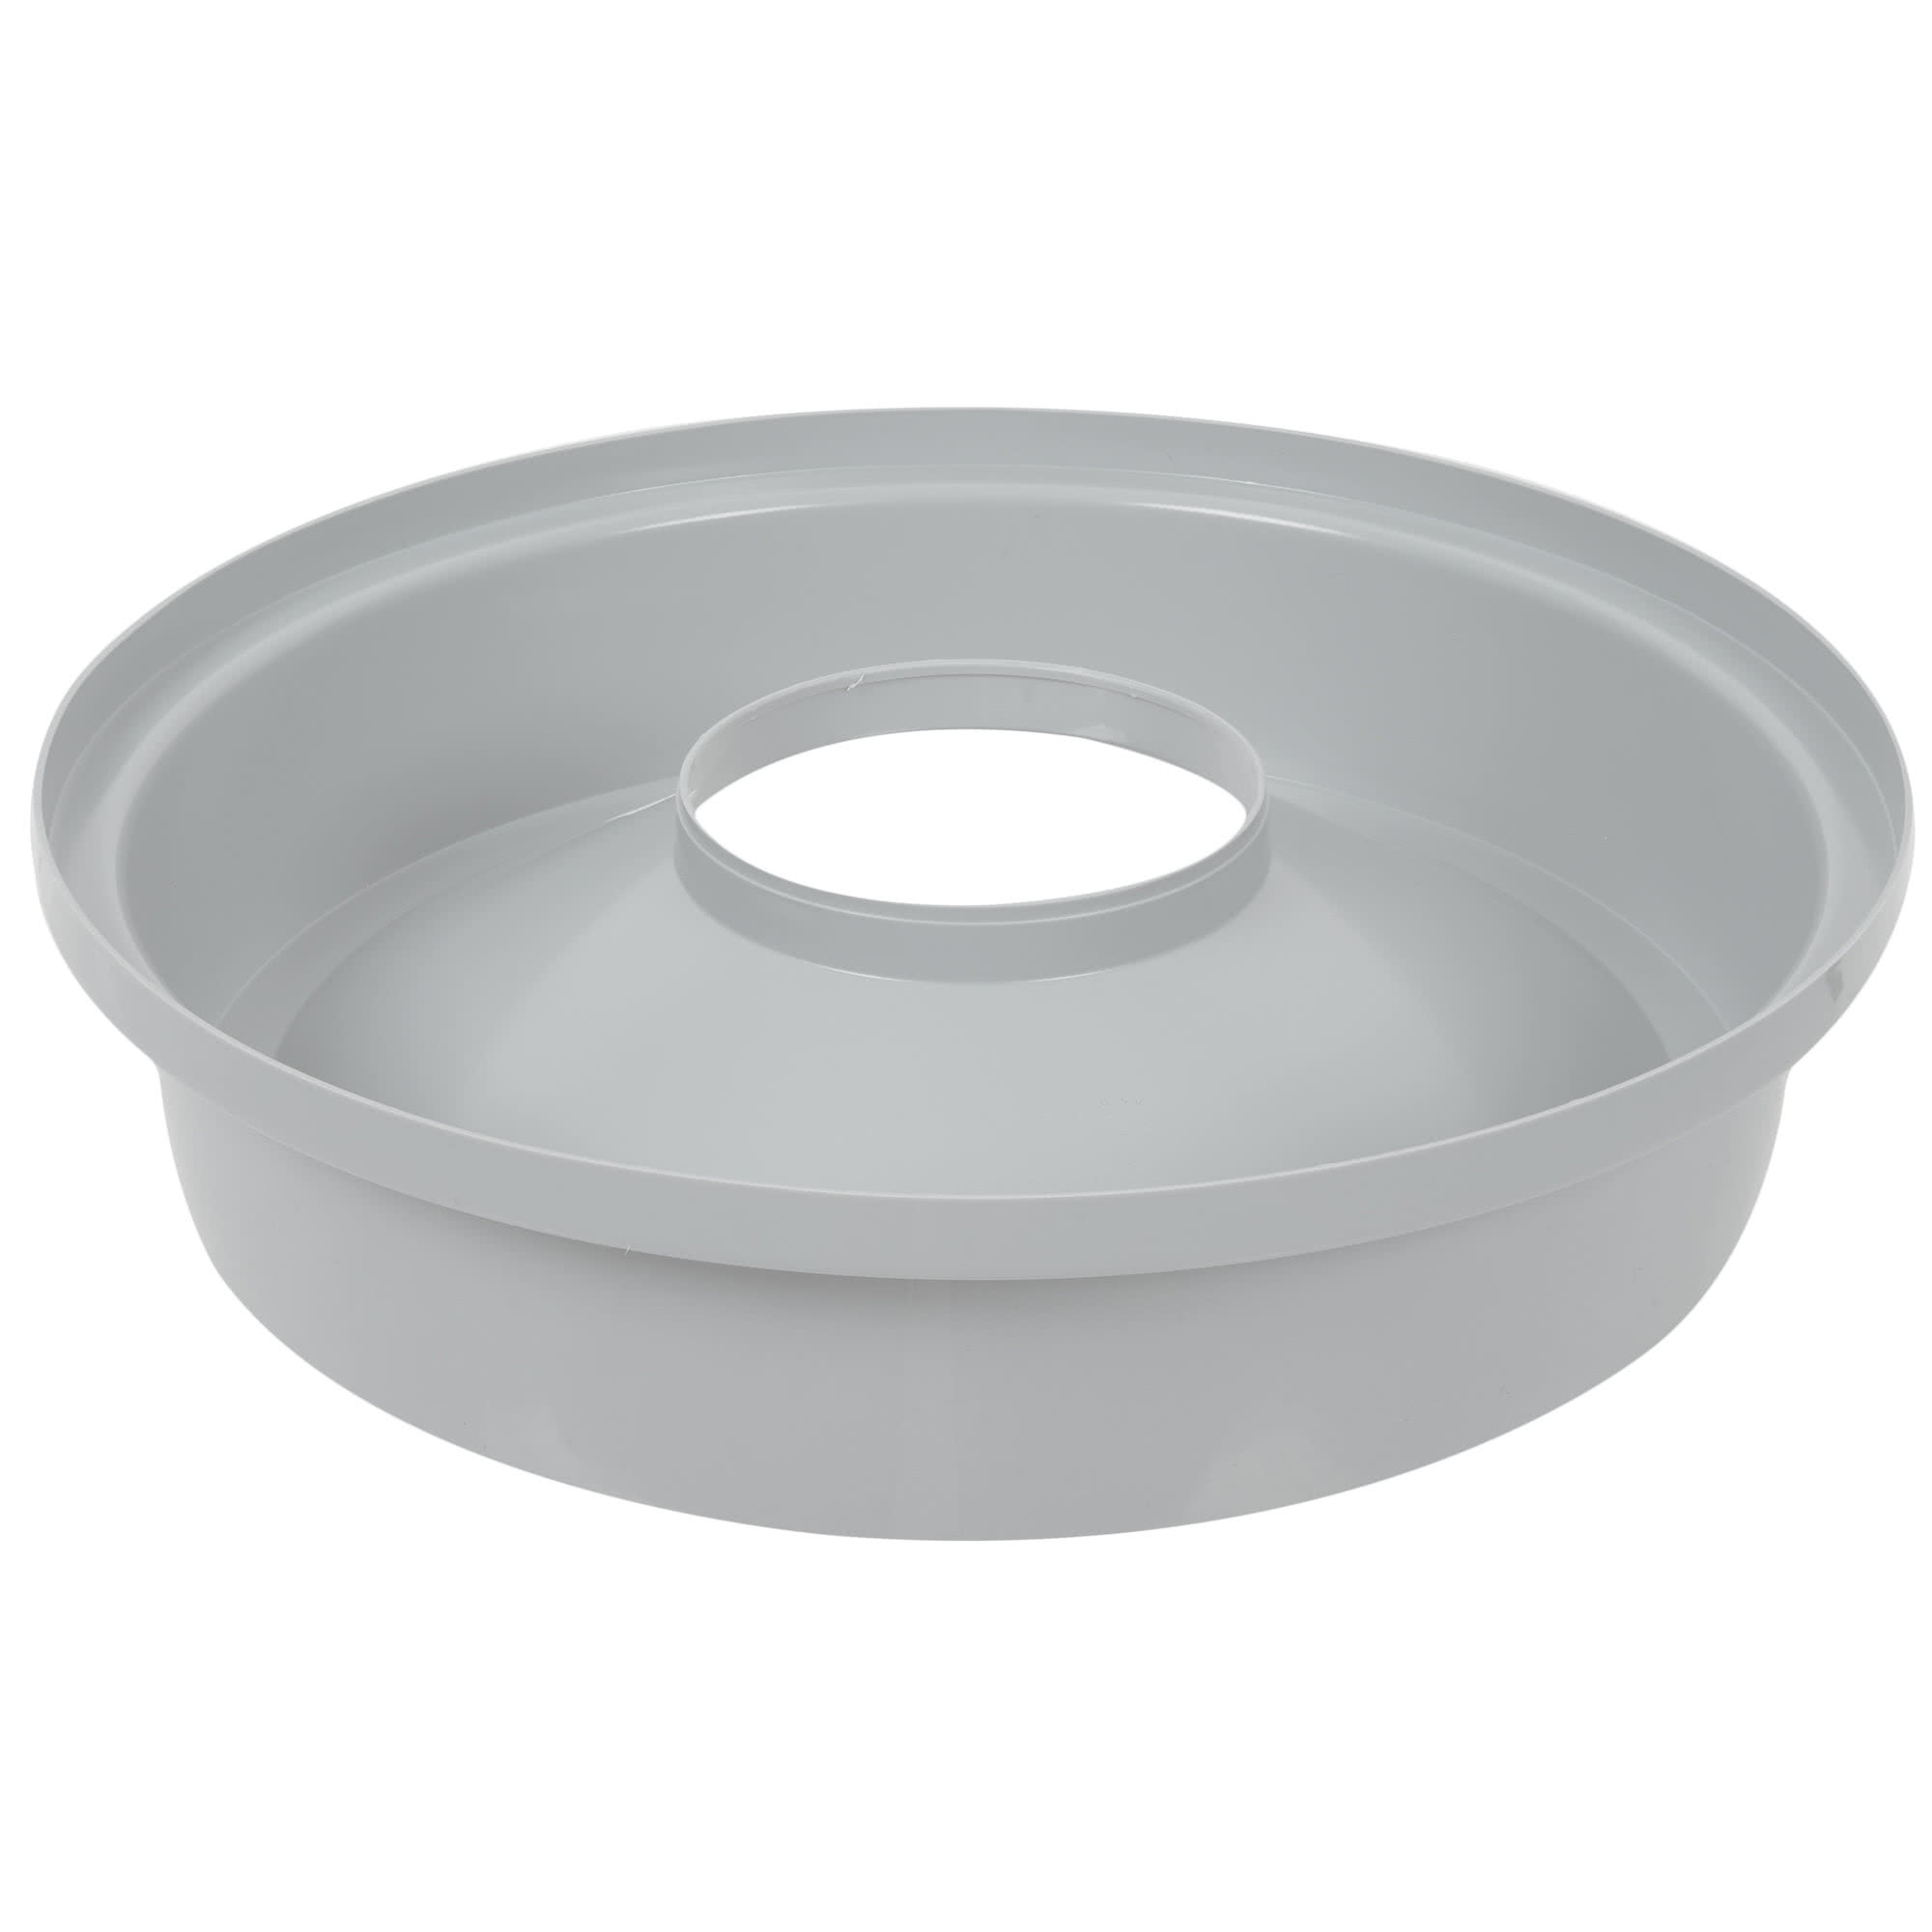 Rubbermaid FG354800GRAY tapa untouchable color gris round funnel top, aplican contenedores FG294700 y FG354600 3